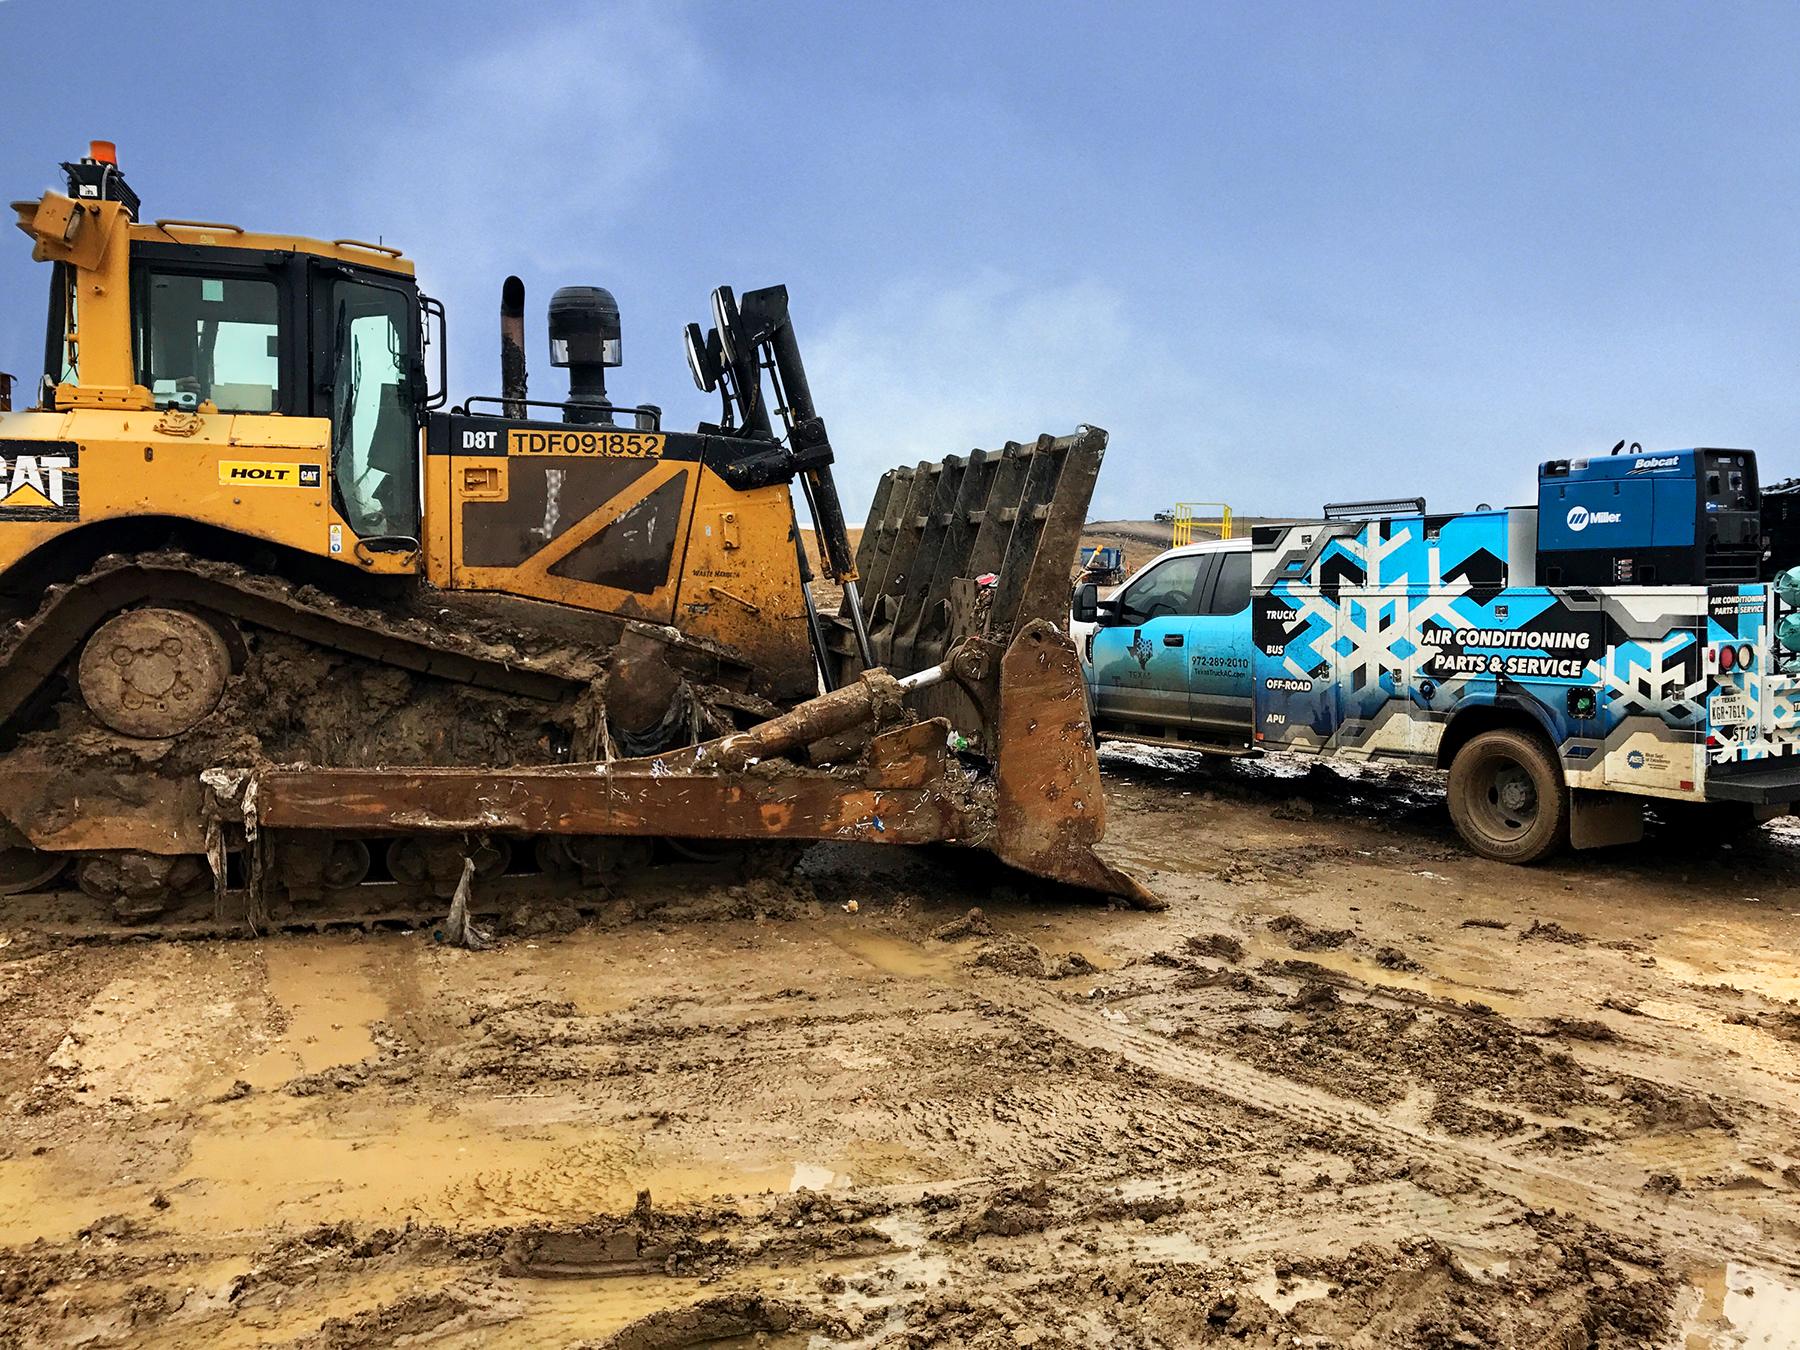 Mobile Fleet Care | Texas Truck A/C